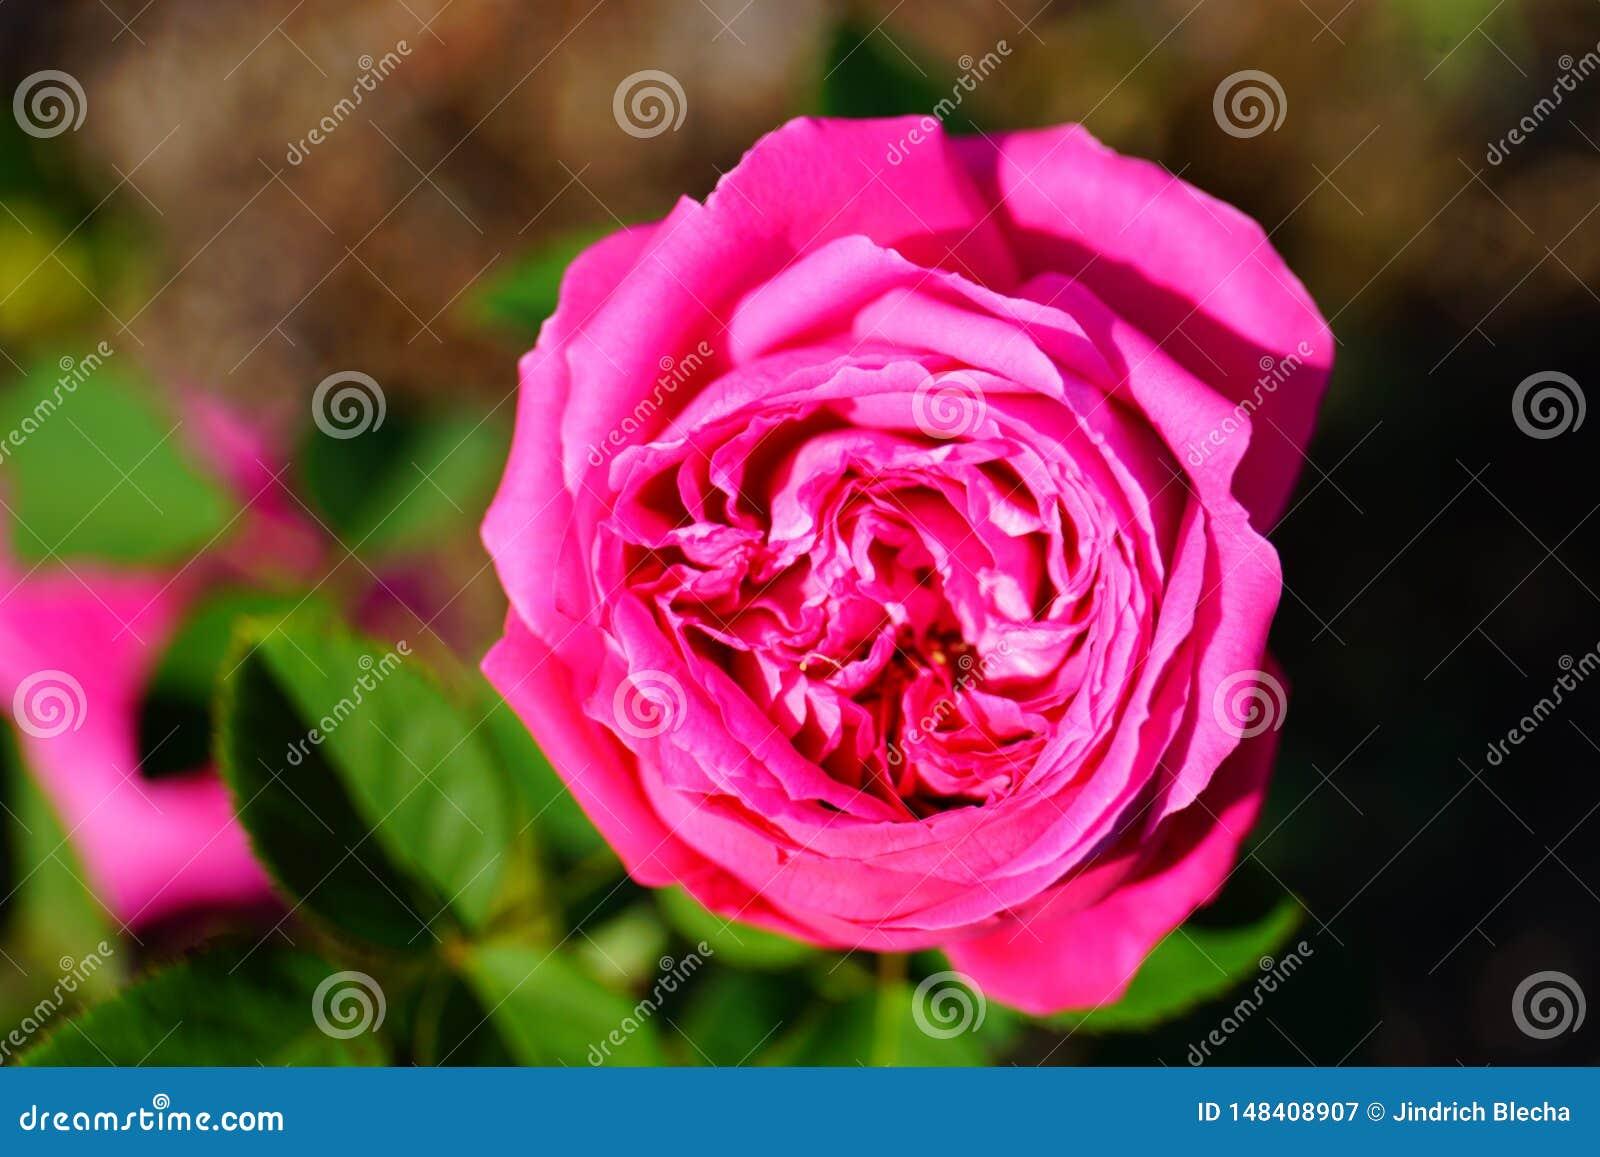 Purple rose in blossom